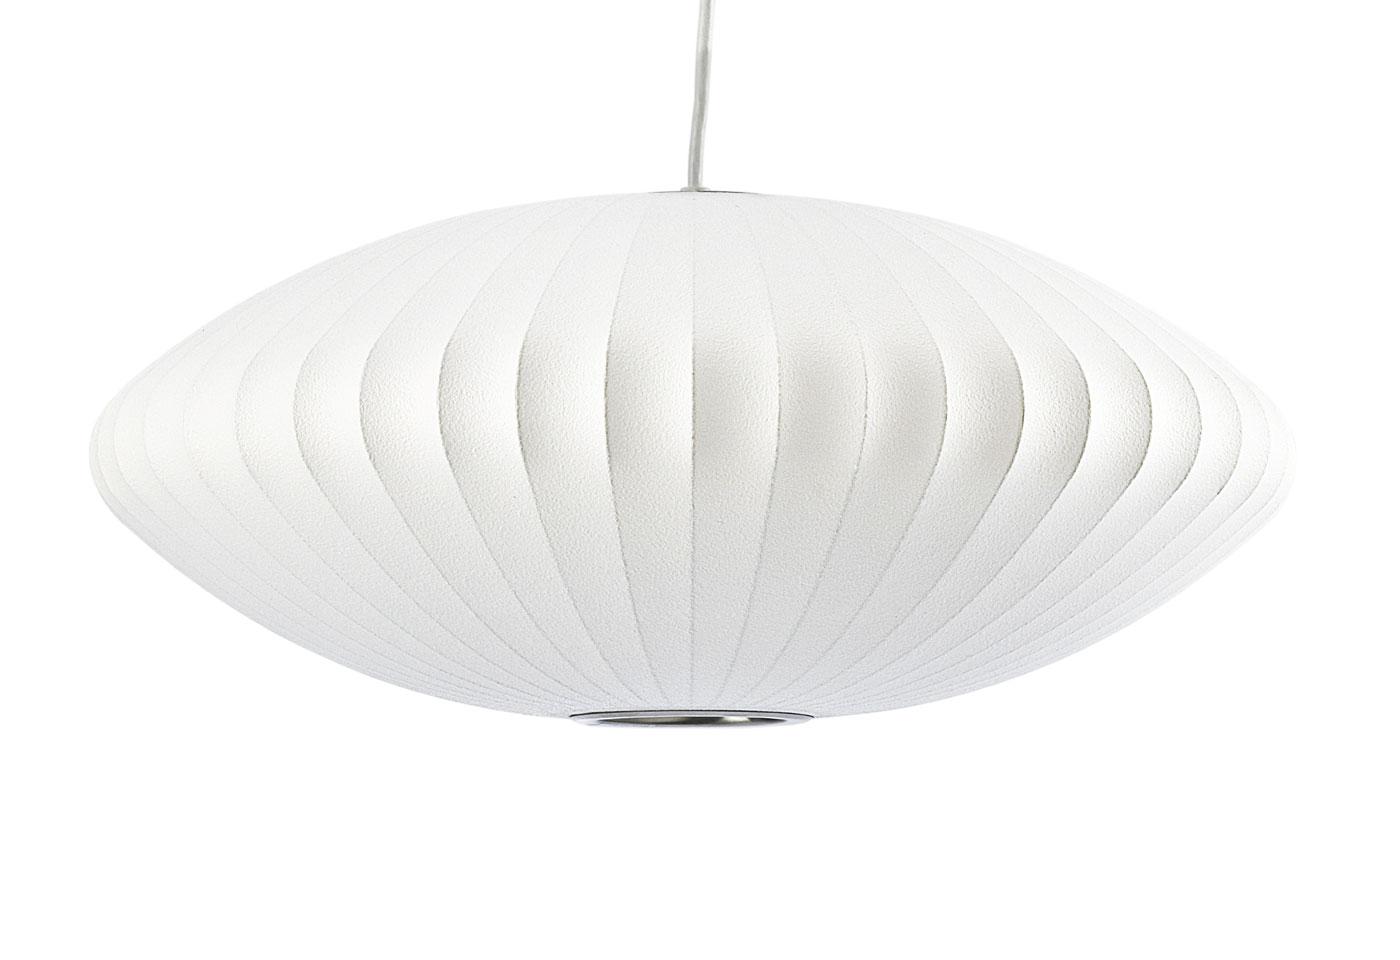 mid century modern lights retro lighting modern lighting. Black Bedroom Furniture Sets. Home Design Ideas